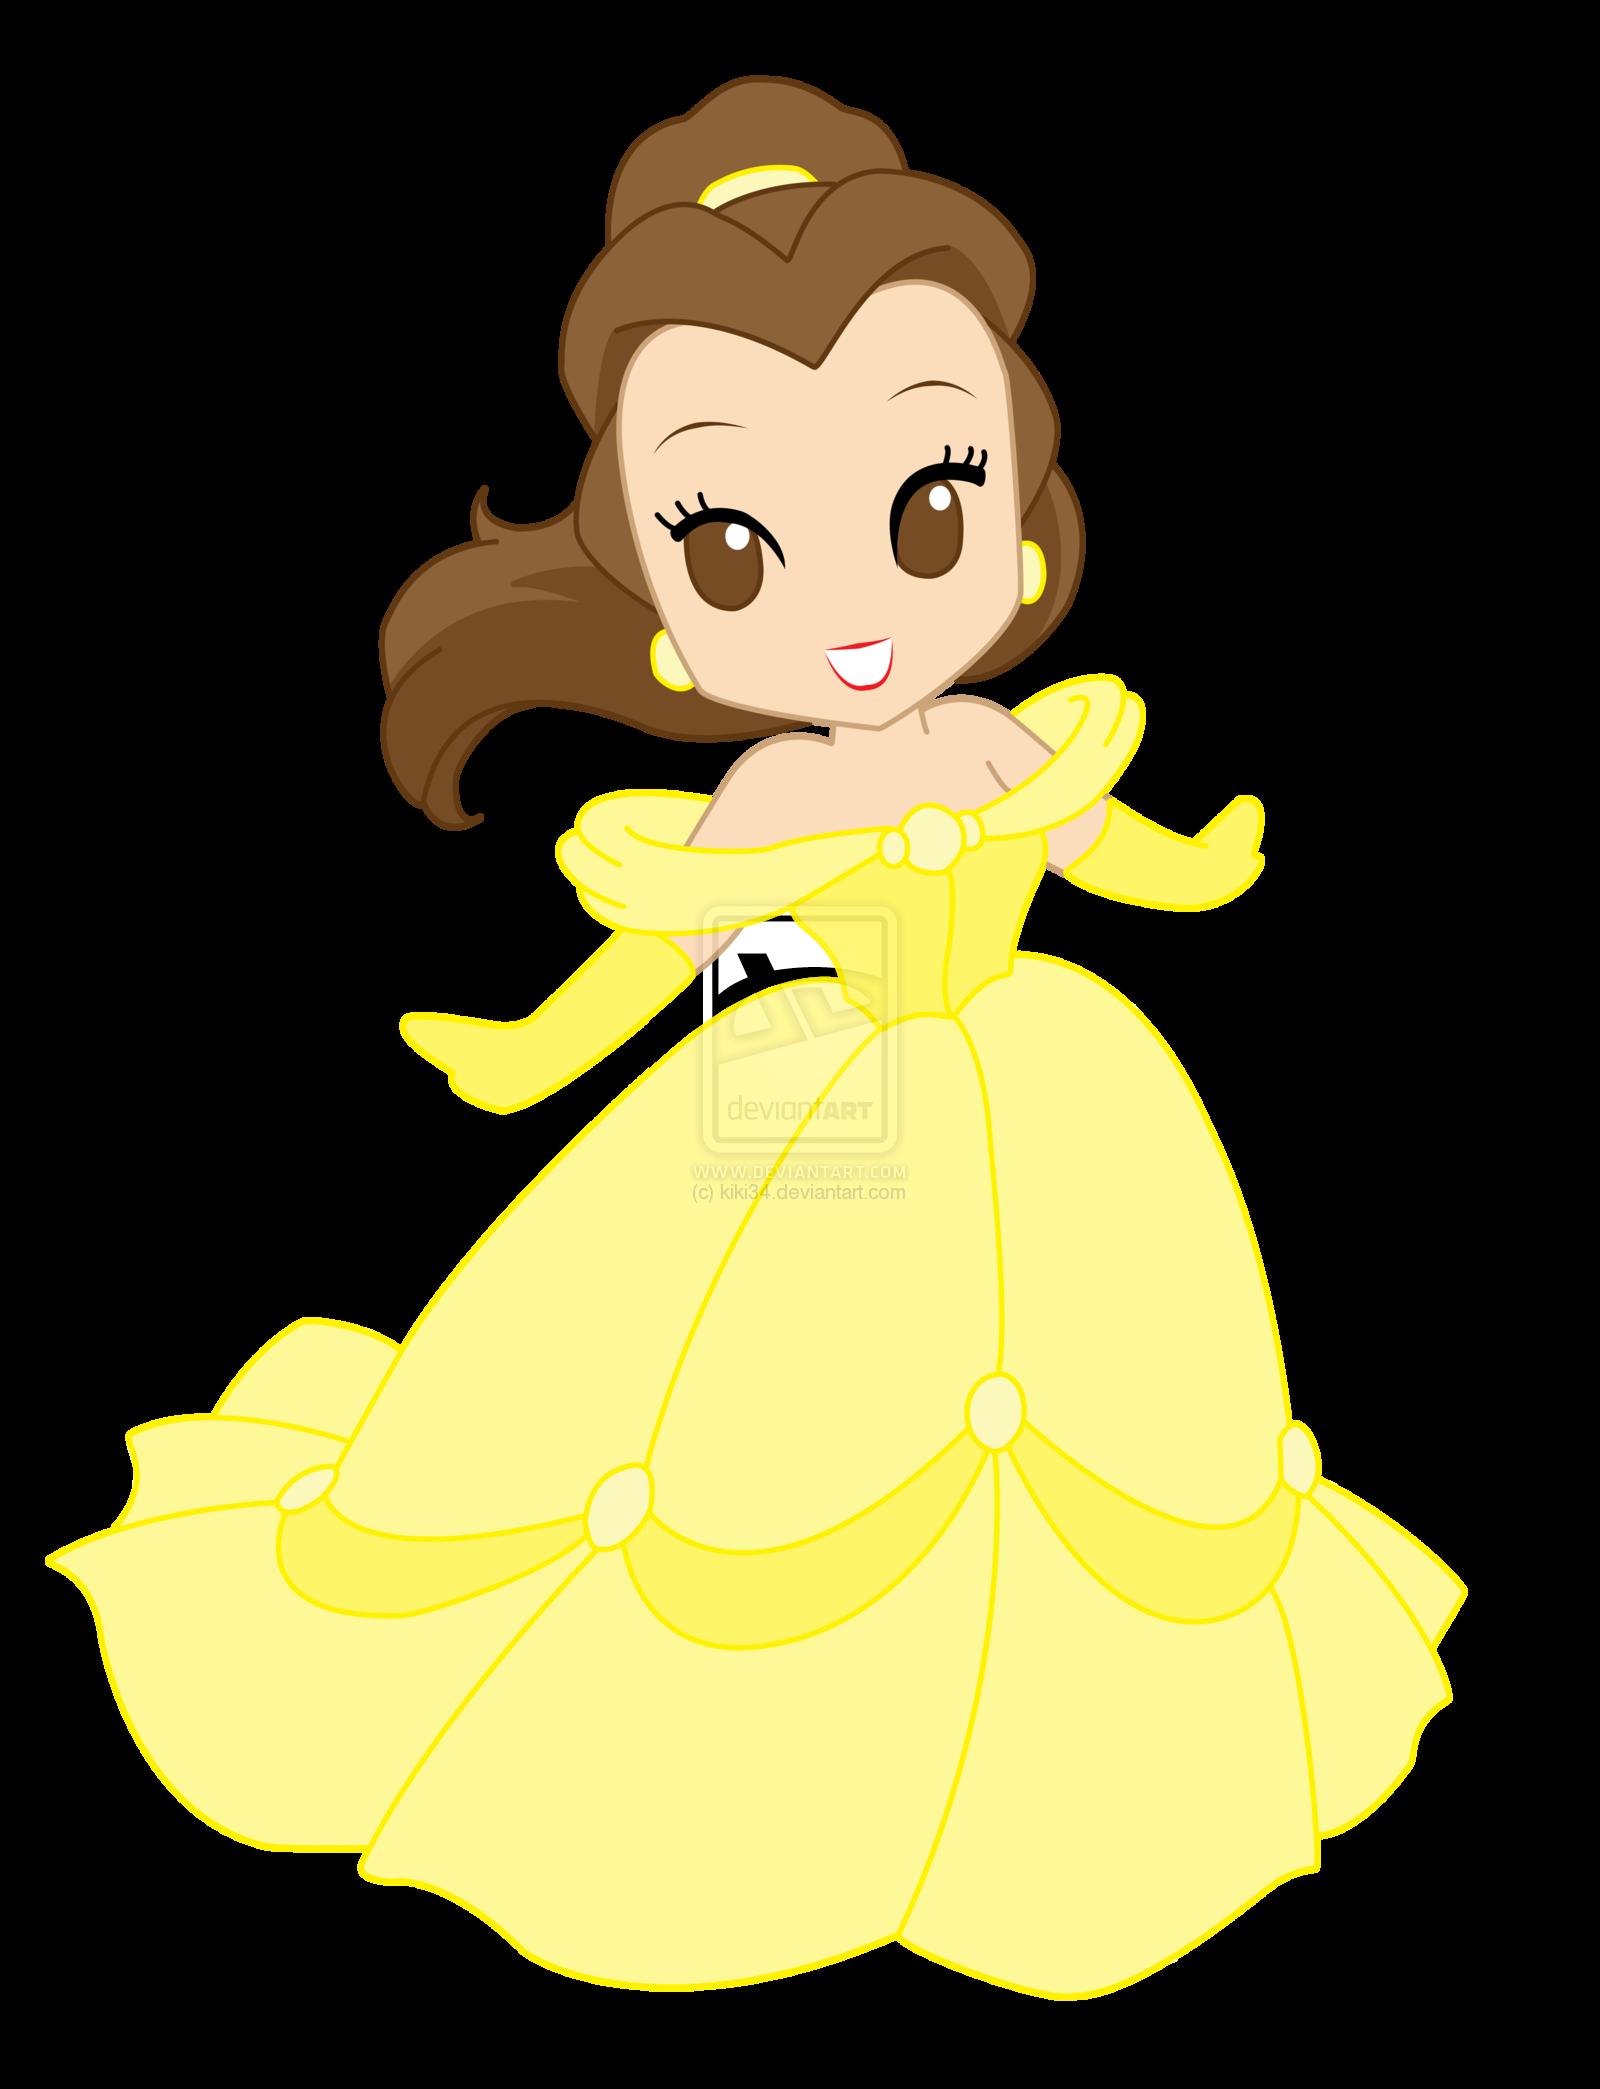 disney princess cartoon drawing at getdrawings com free for